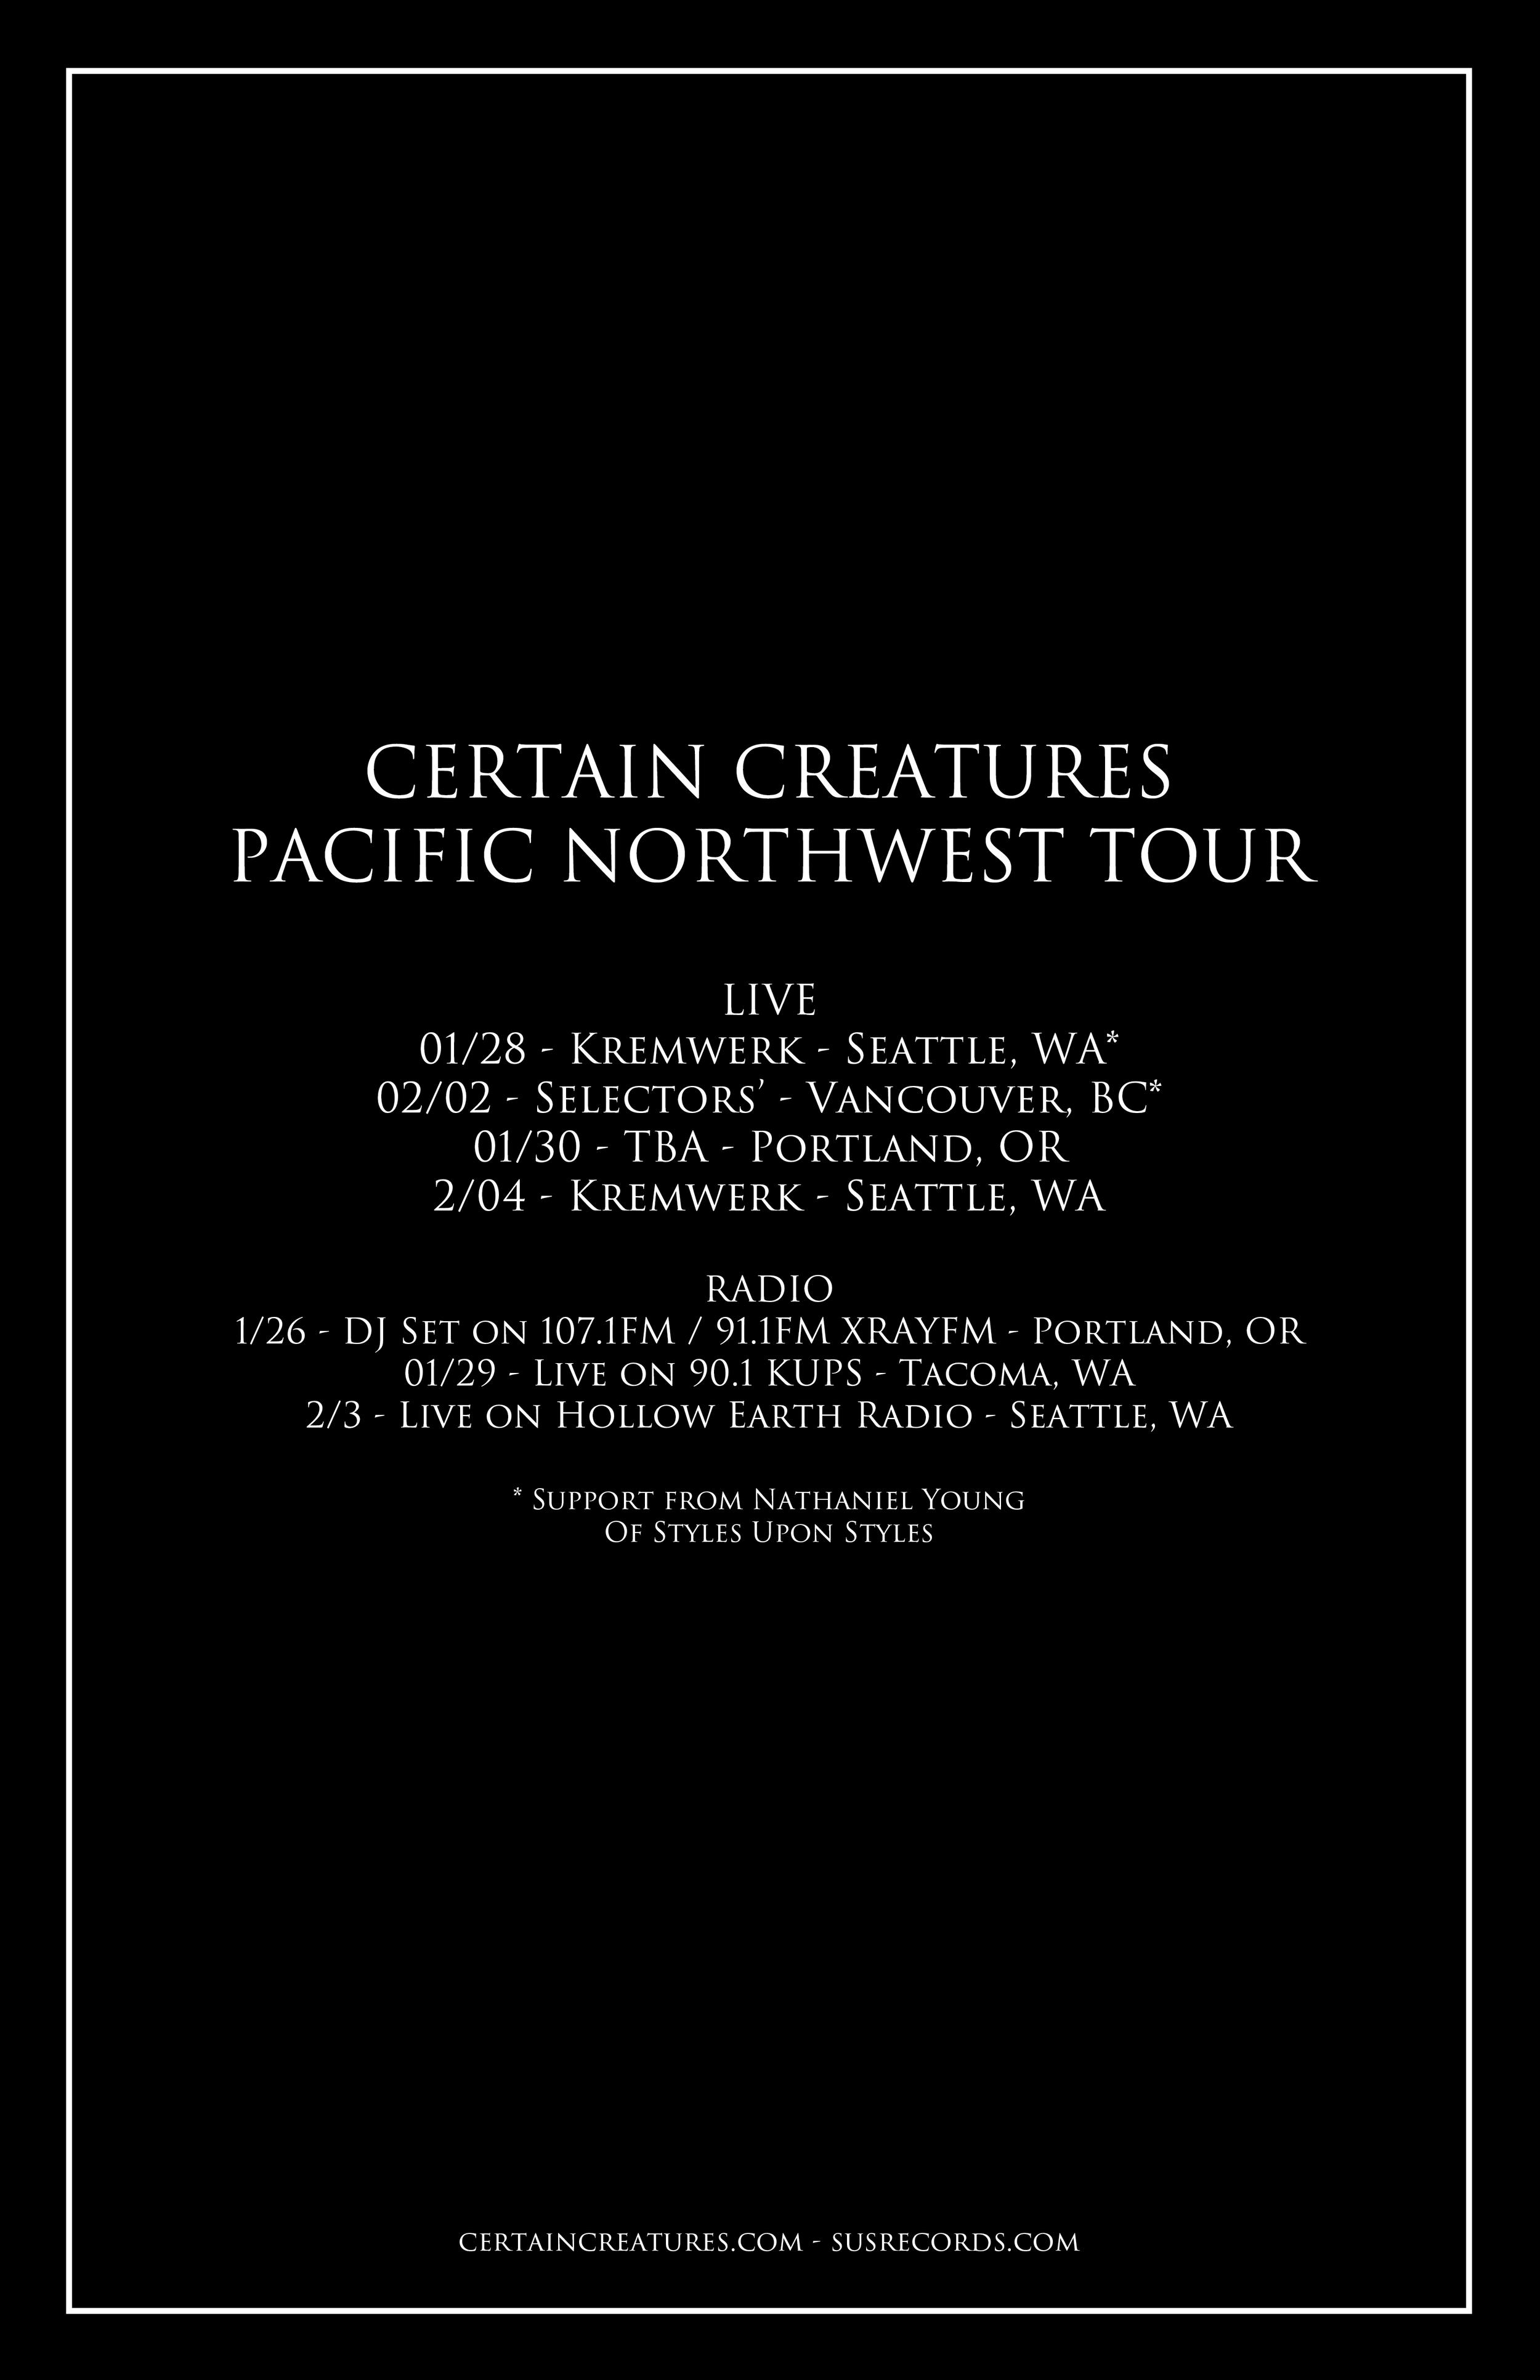 cc_pnw_tour_poster.png